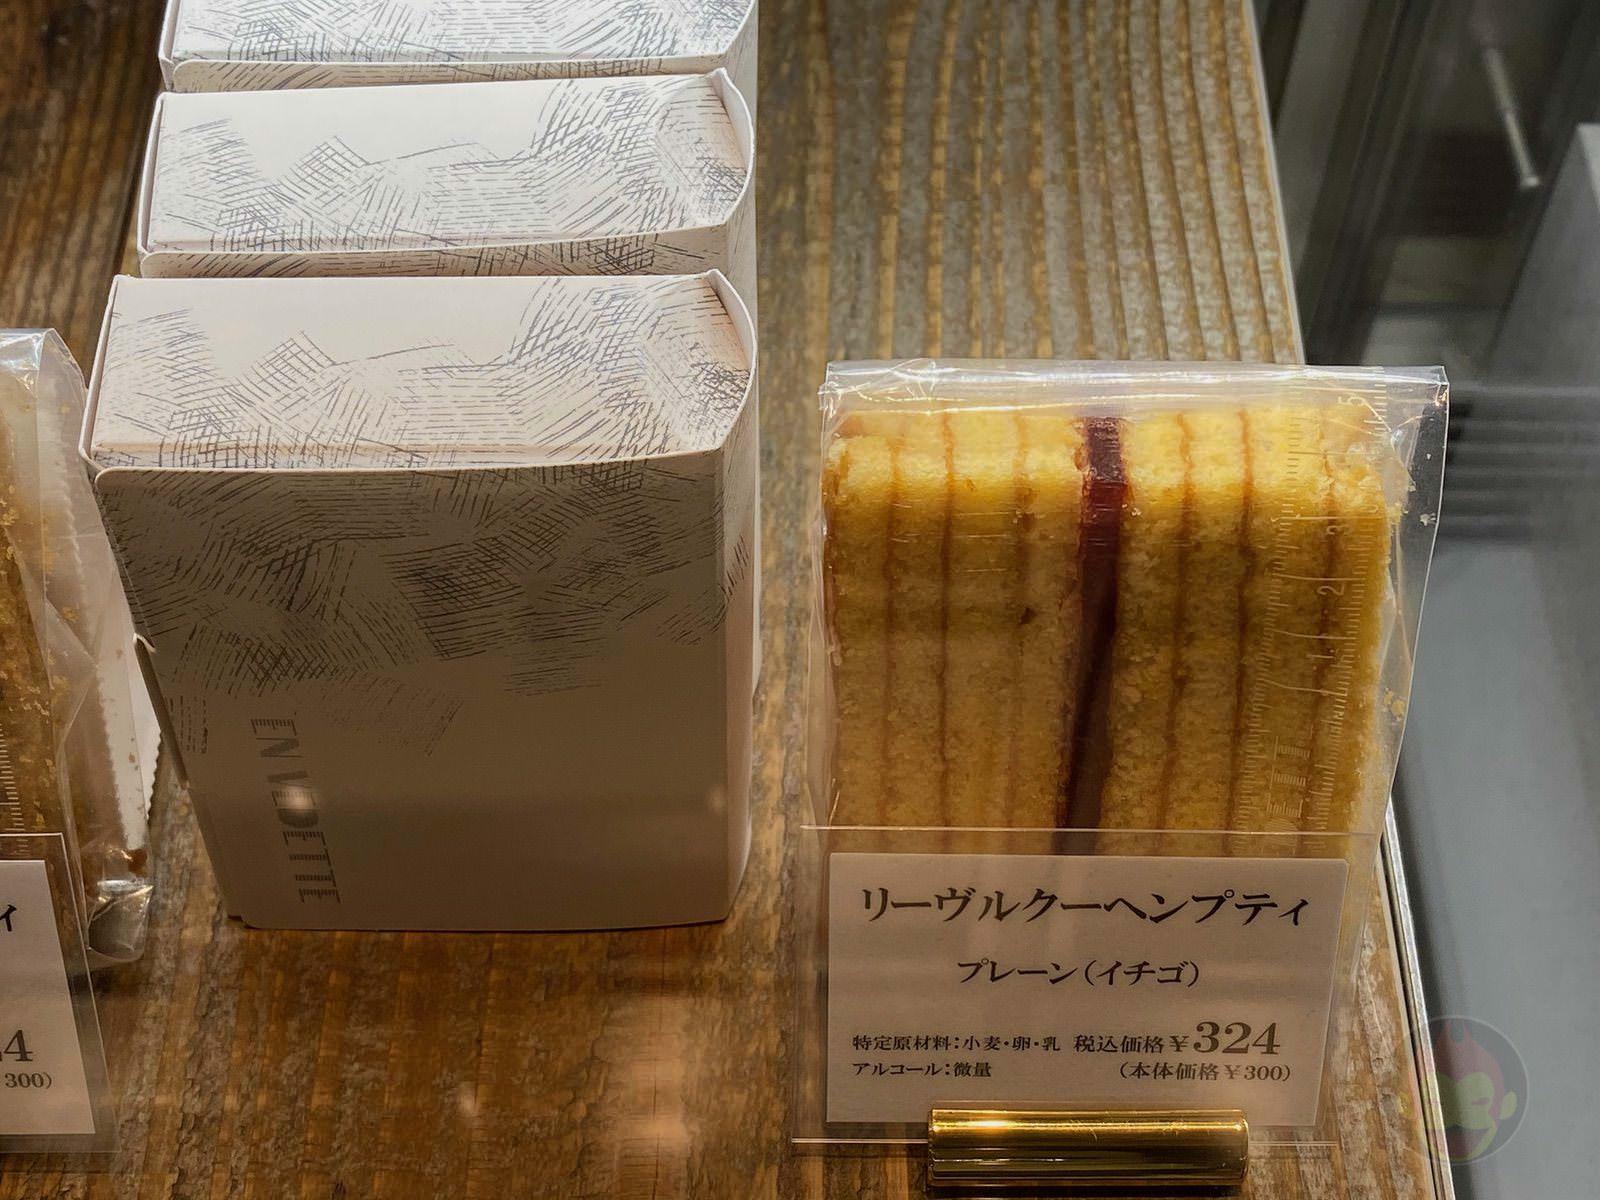 Shibuya-Scramble-Square-Food-I-Ate-74.jpeg